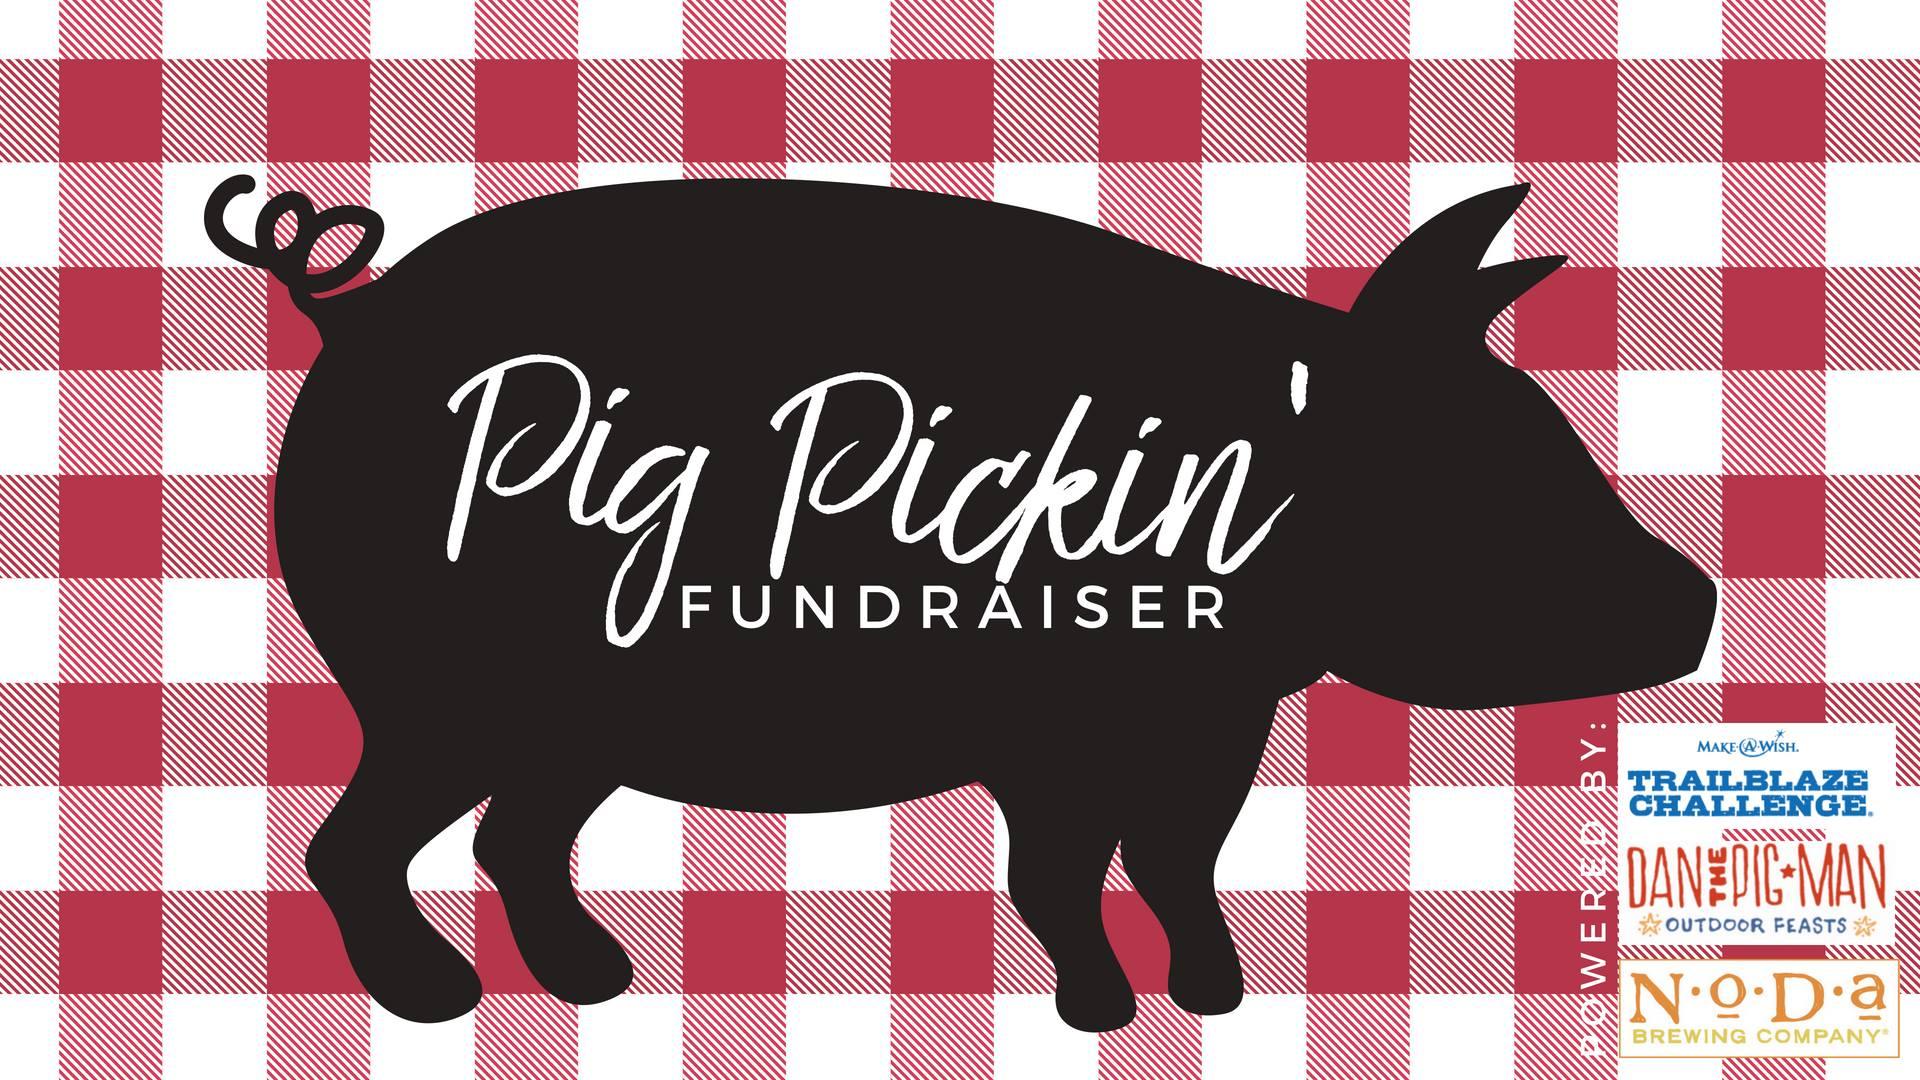 Pig Pickin\' Fundraiser.